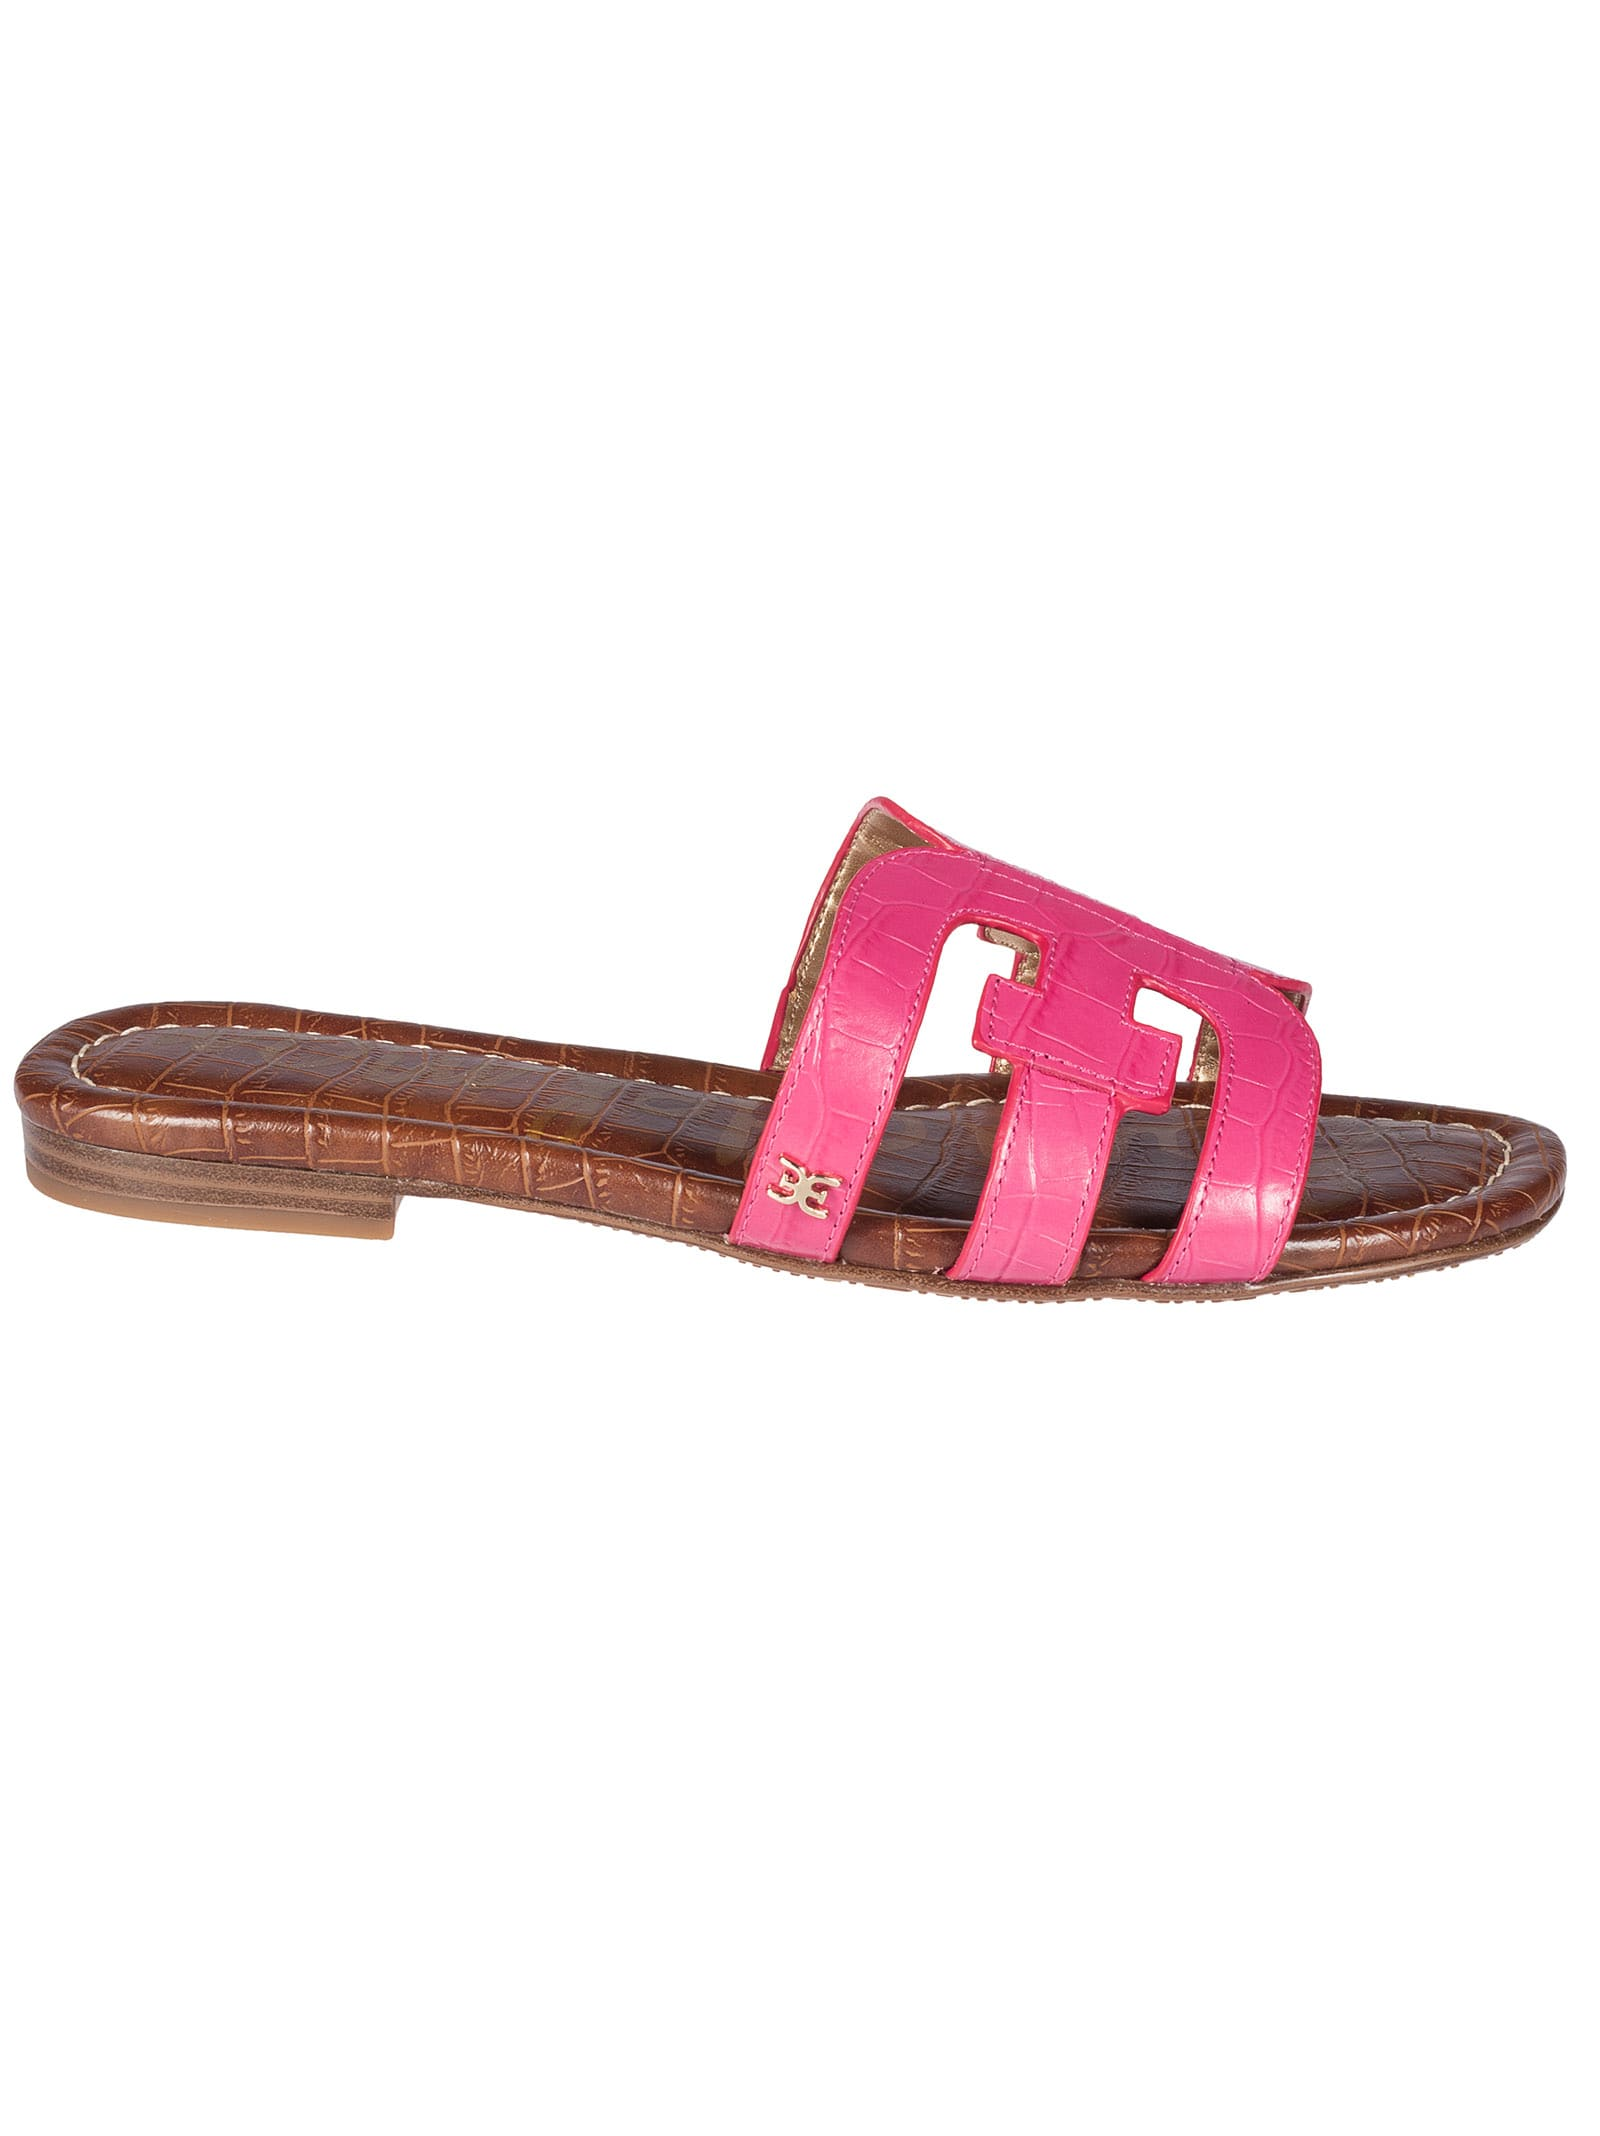 Buy Sam Edelman Bay Double E Sandals online, shop Sam Edelman shoes with free shipping